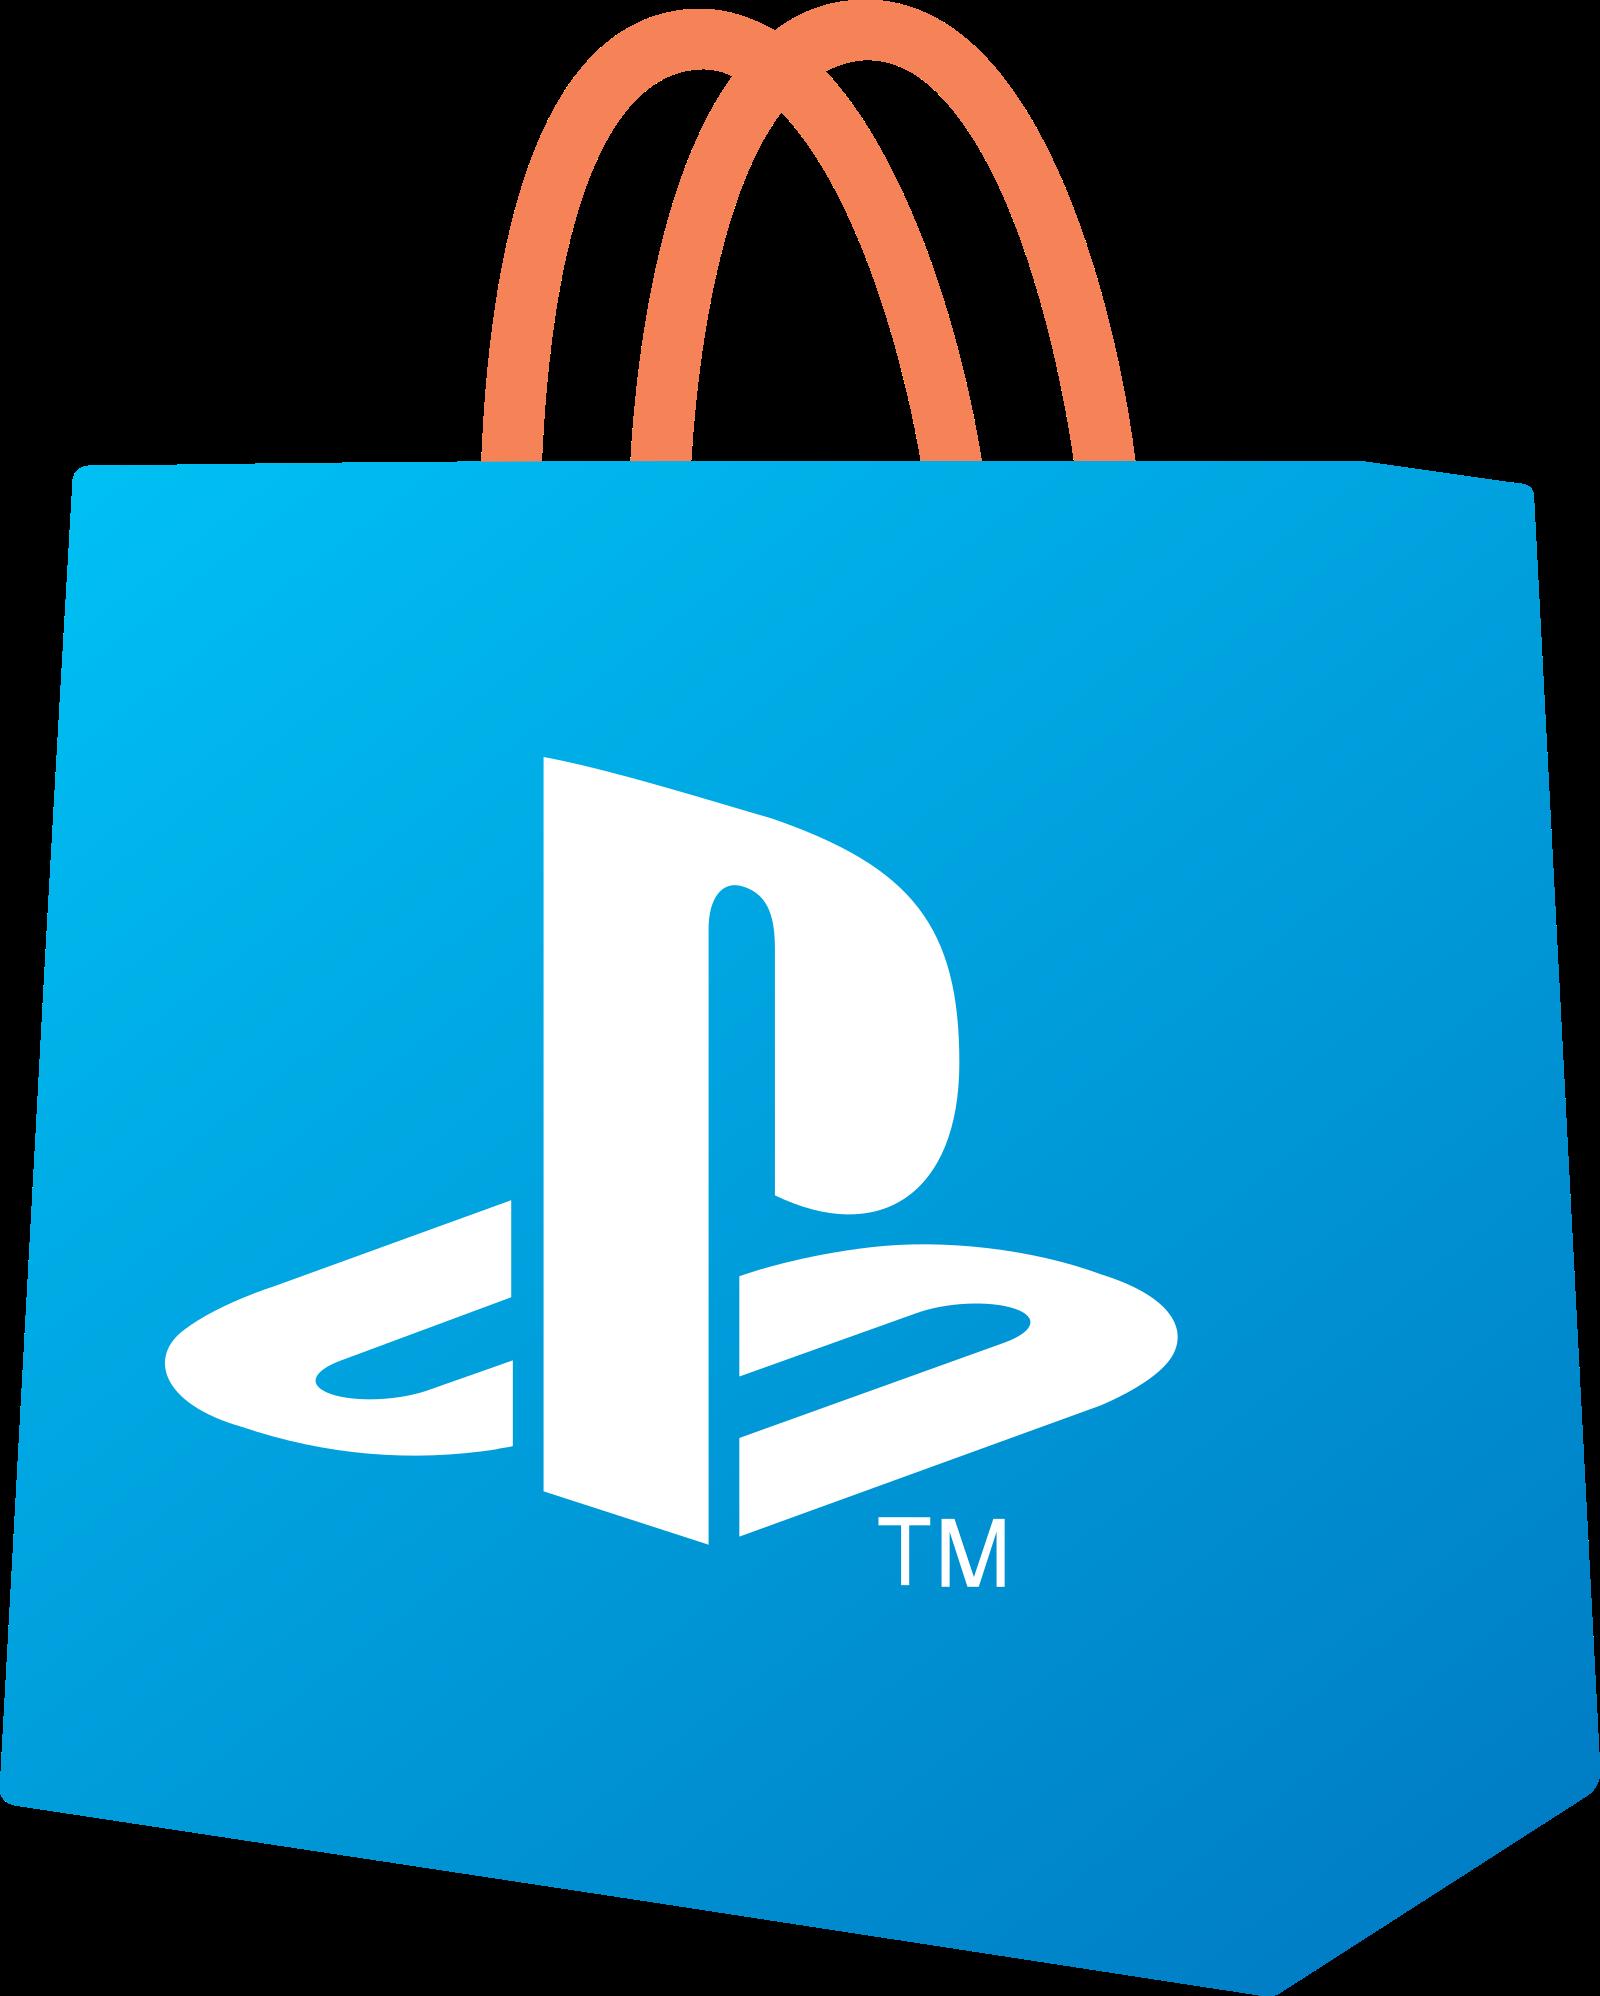 playstation store logo 5 - PlayStation Store Logo